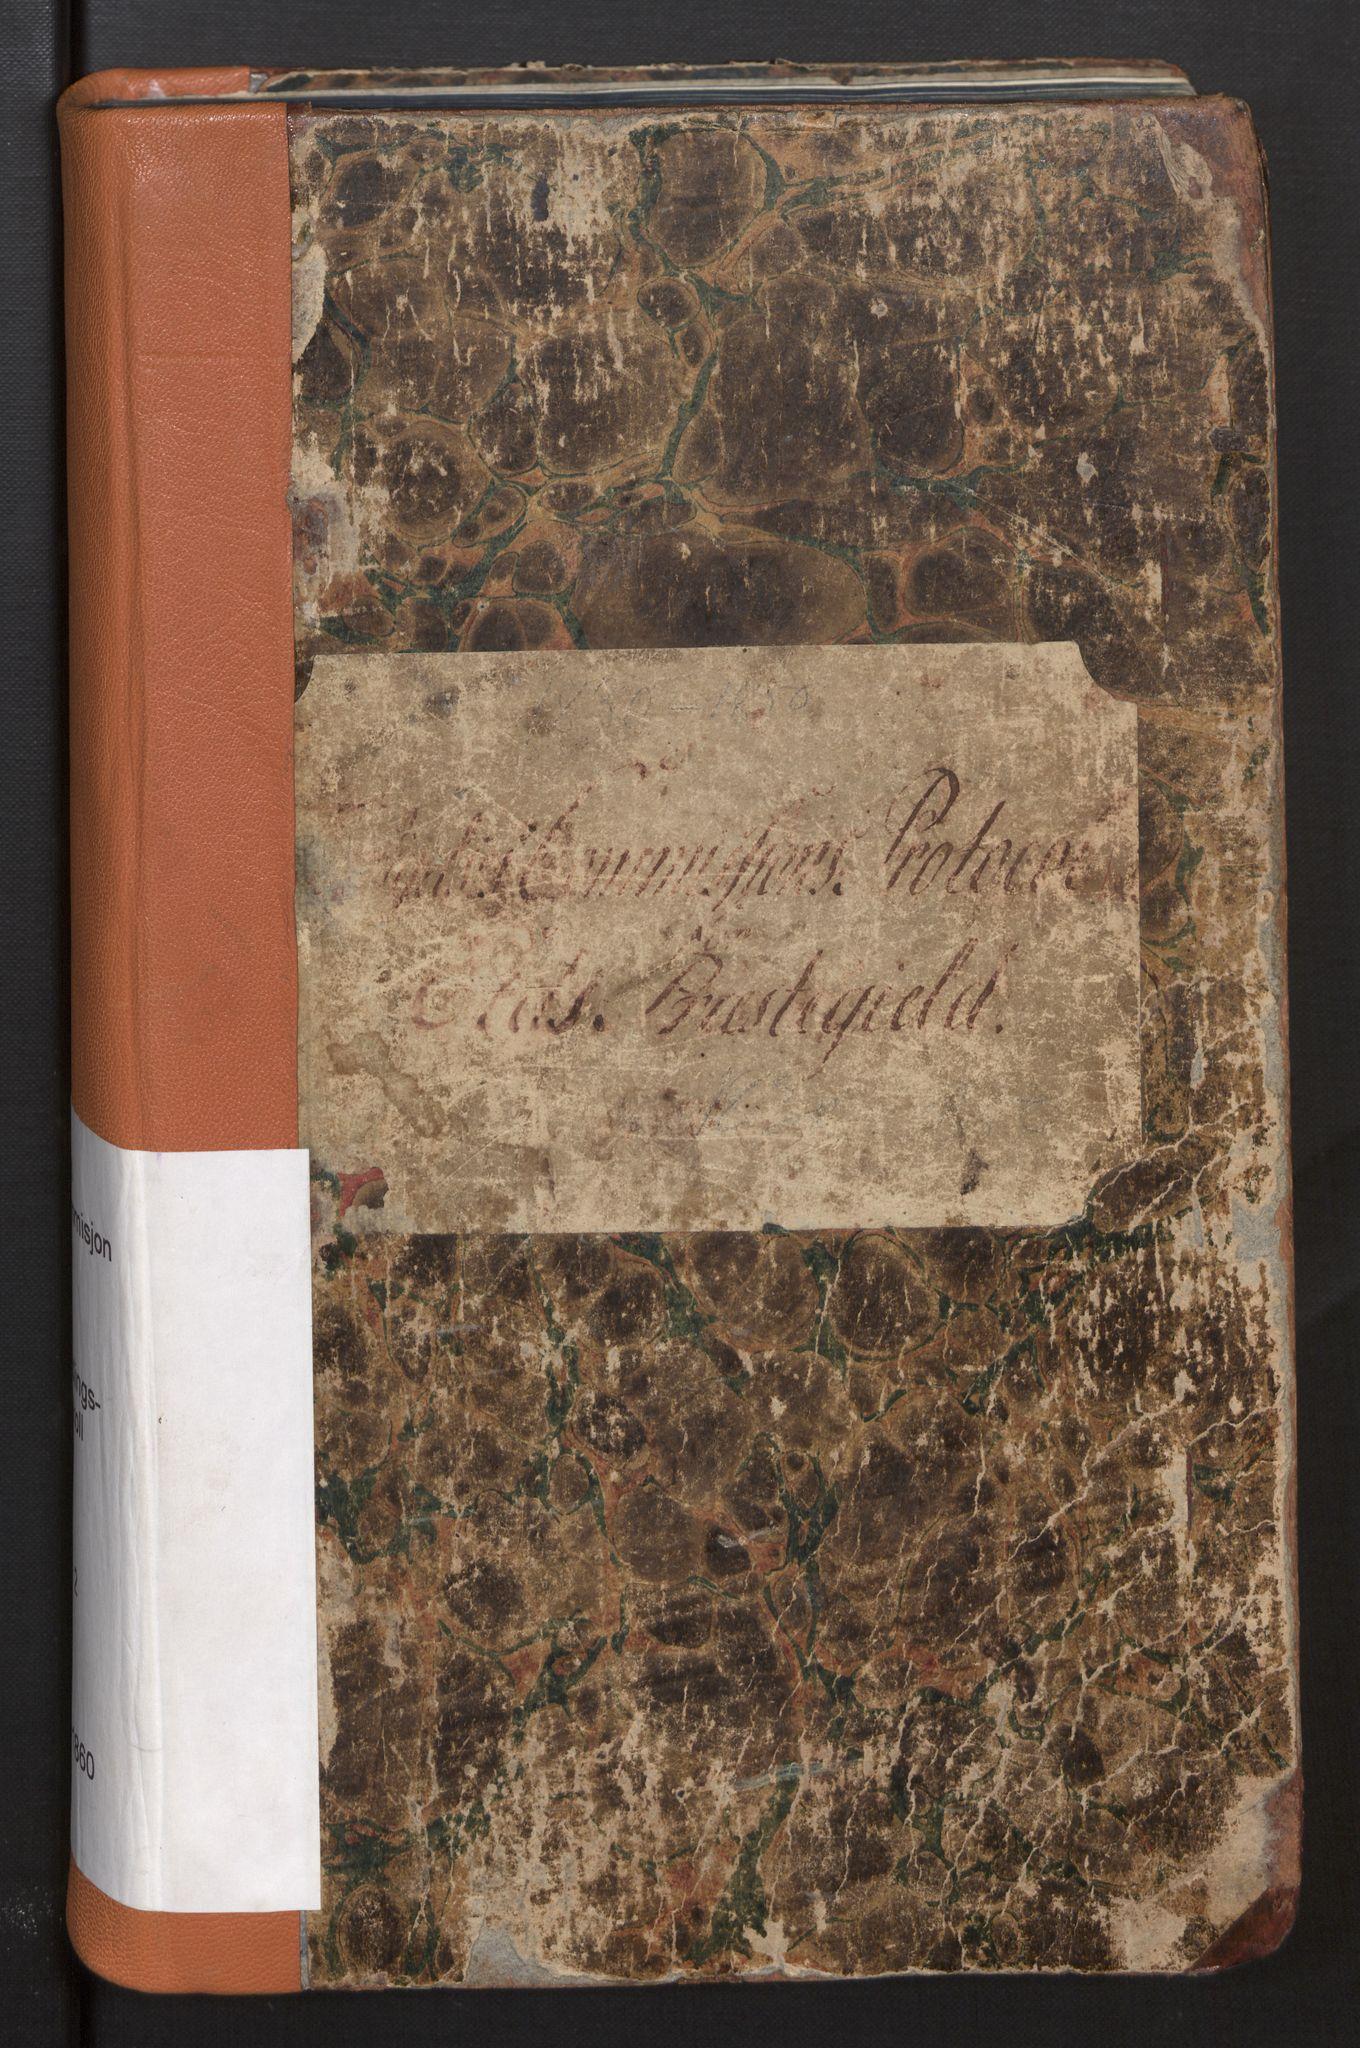 SAB, Eid (og Davik) forliksråd, A/L0002: Forhandlingsprotokoll, 1830-1850